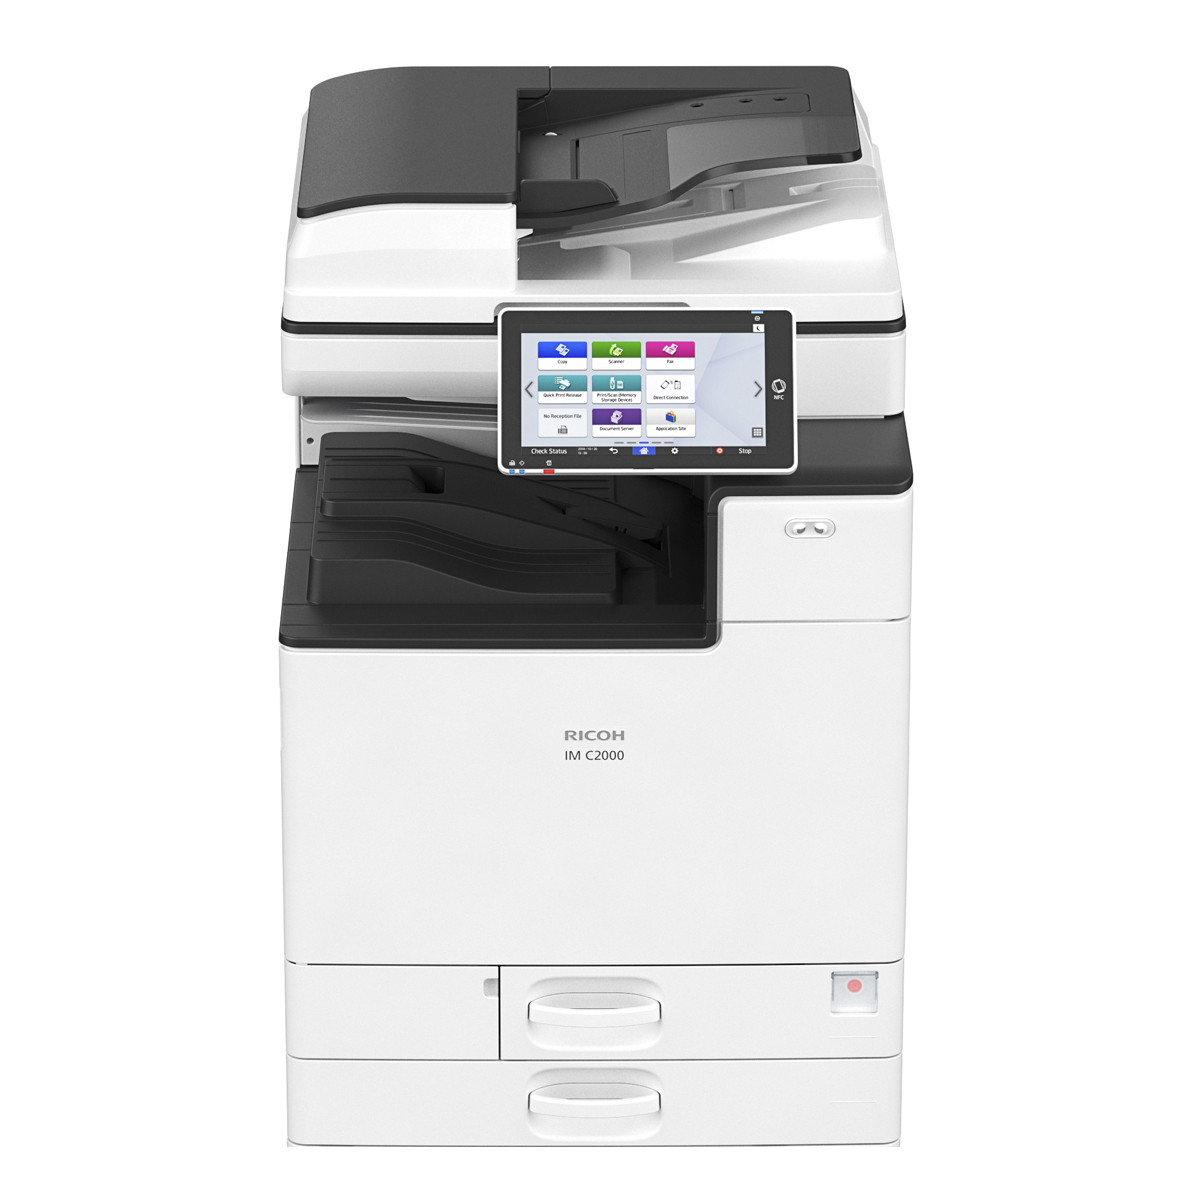 Impressora Ricoh IM C2000 | Multifuncional Laser Colorida A3 com Rede